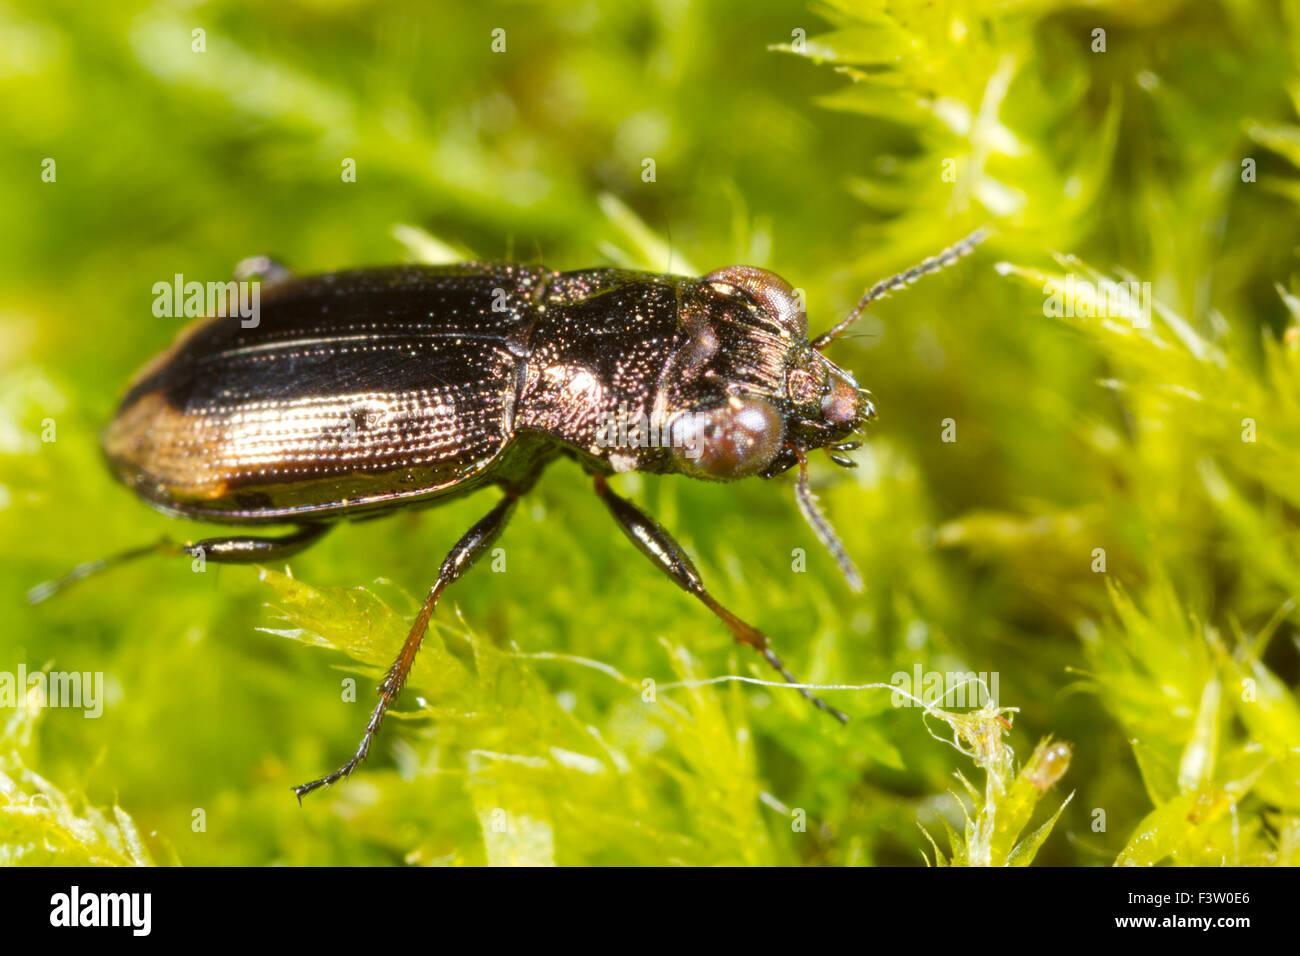 Big-eyed massa di bronzo-beetle (Notiophilus biguttatus) tra il muschio. Powys, Galles. Maggio. Immagini Stock